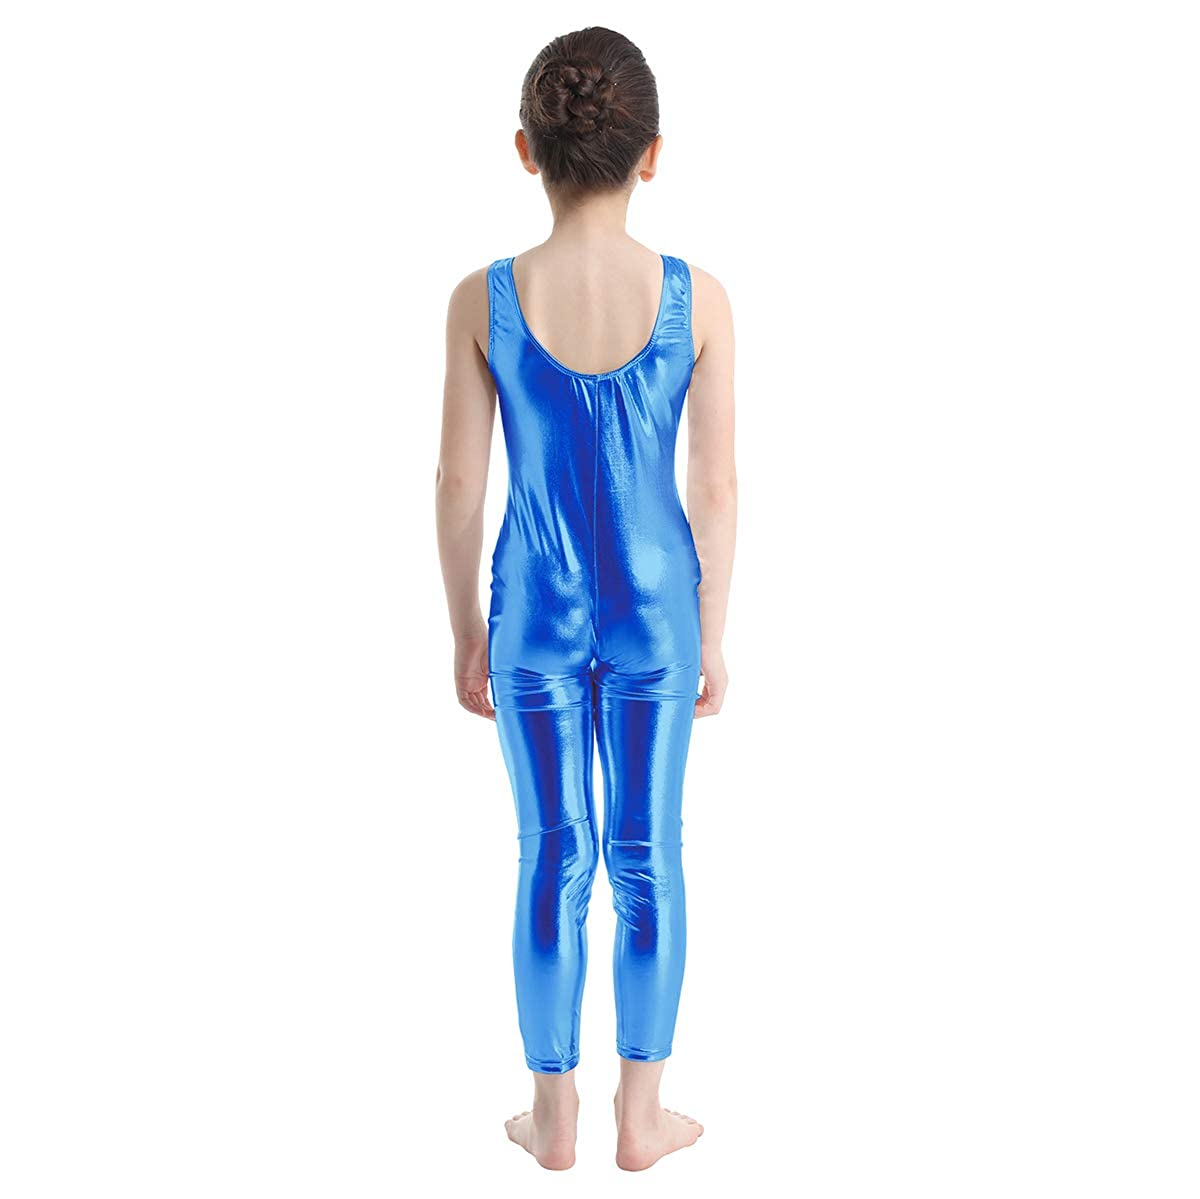 Yeahdor Kids Girls Shiny Metallic Ballet Dance Tank Leotard Unitard Dancewear Gymnastics Bodysuit Full Body Catsuit